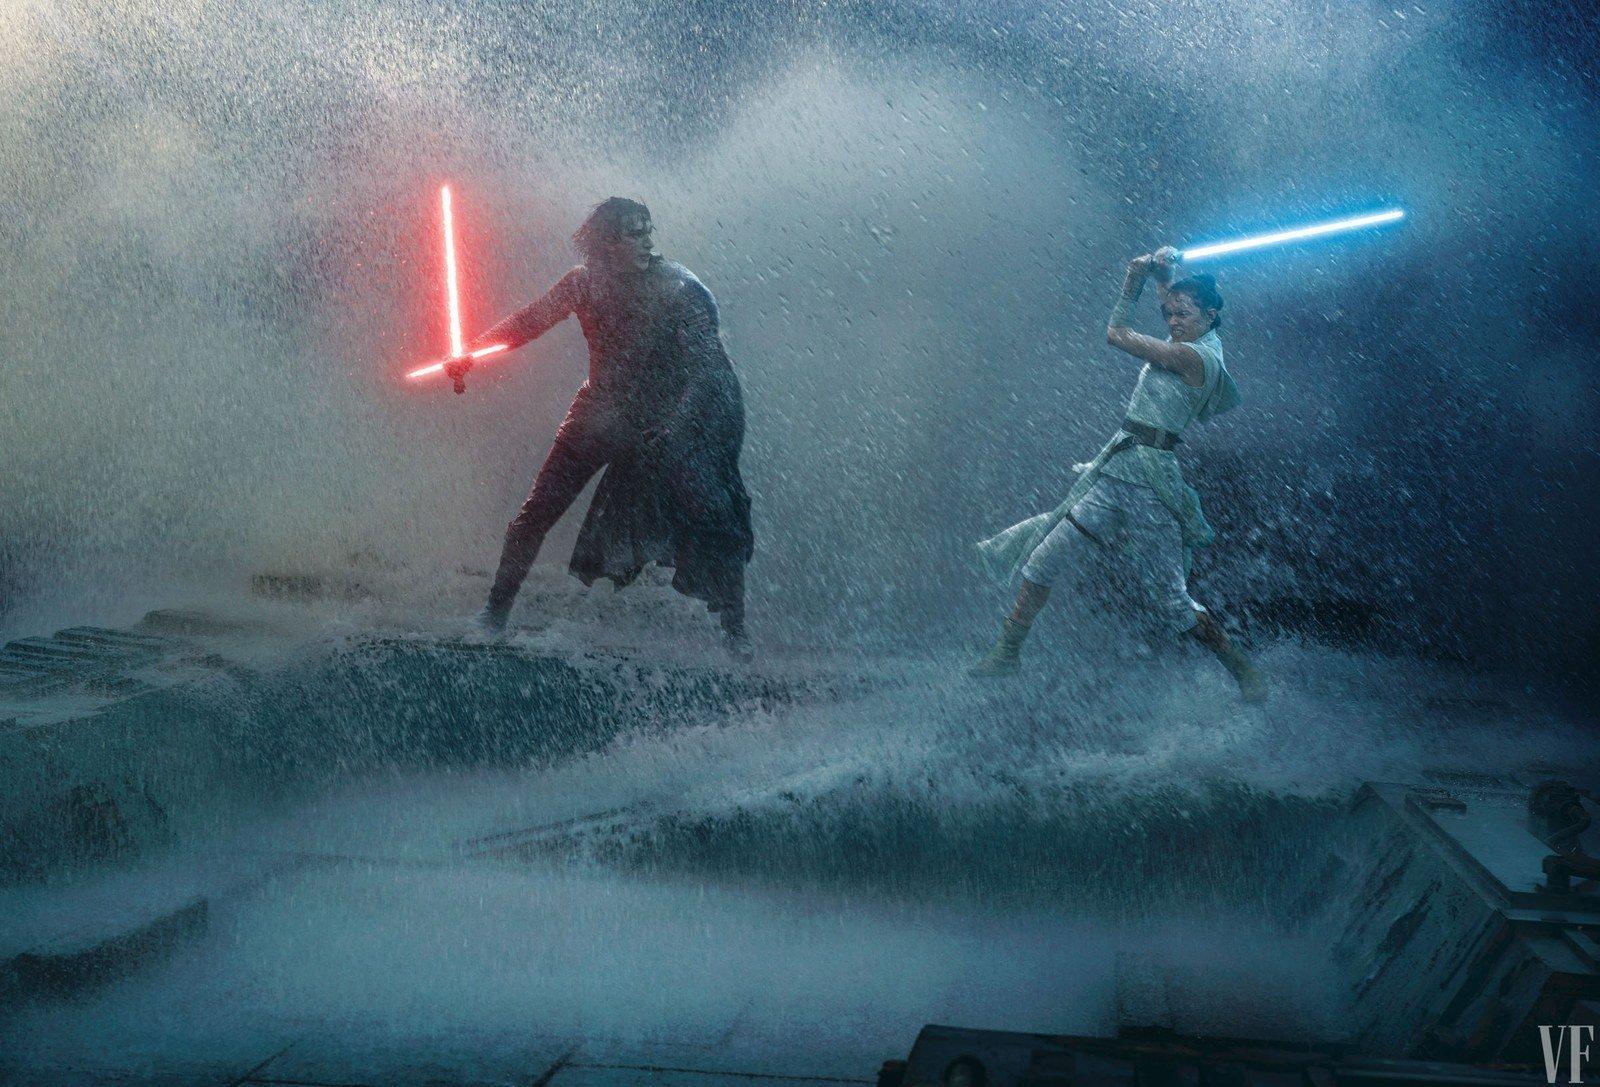 Rey vs. Kylo